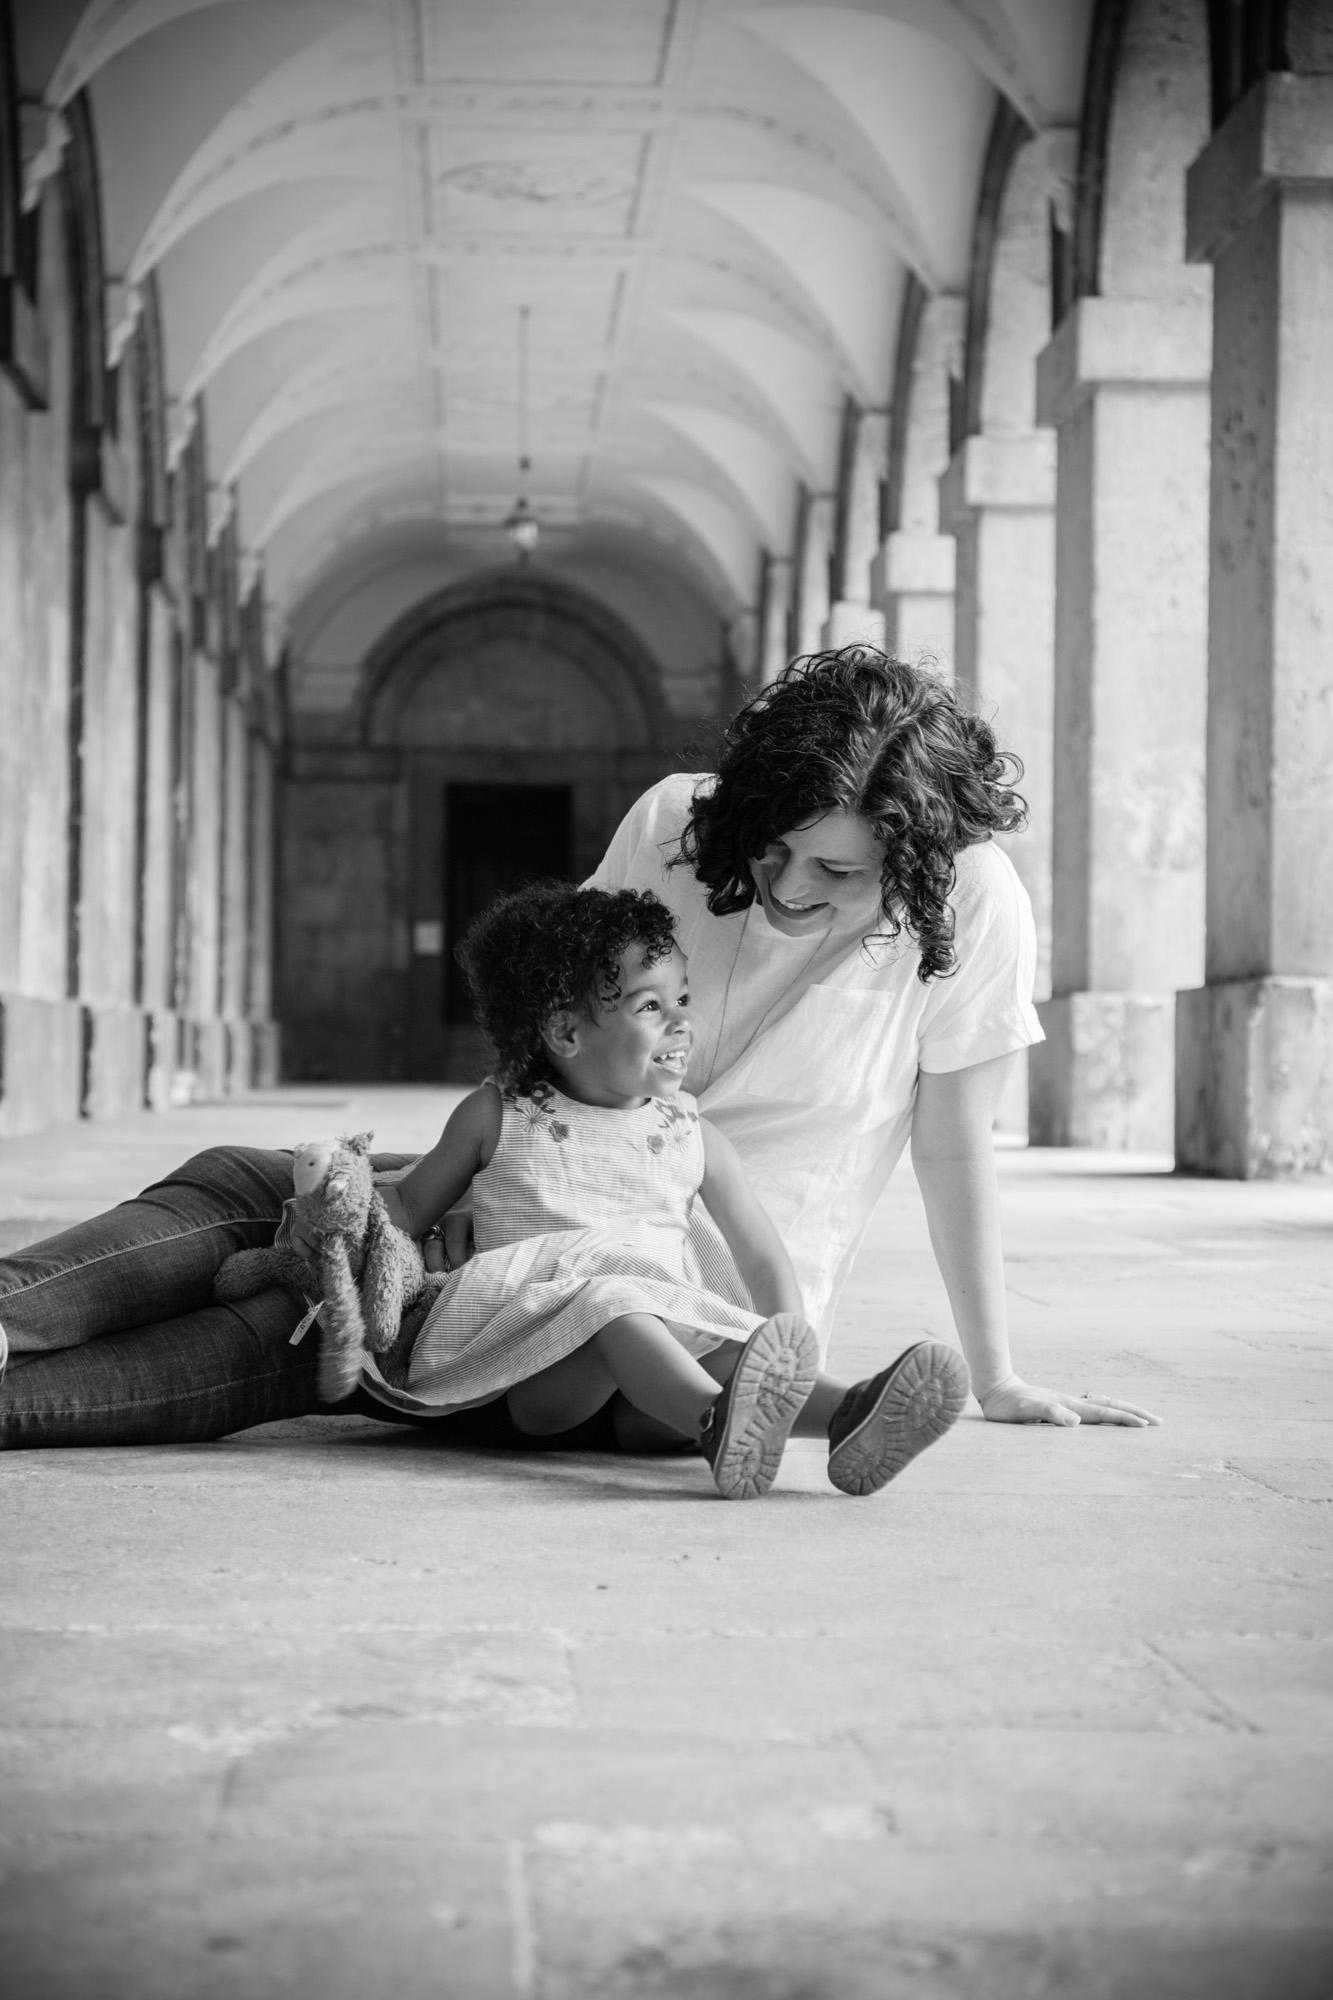 family-life-family-photographer-oxford-london-jonathan-self-photography-18.jpg